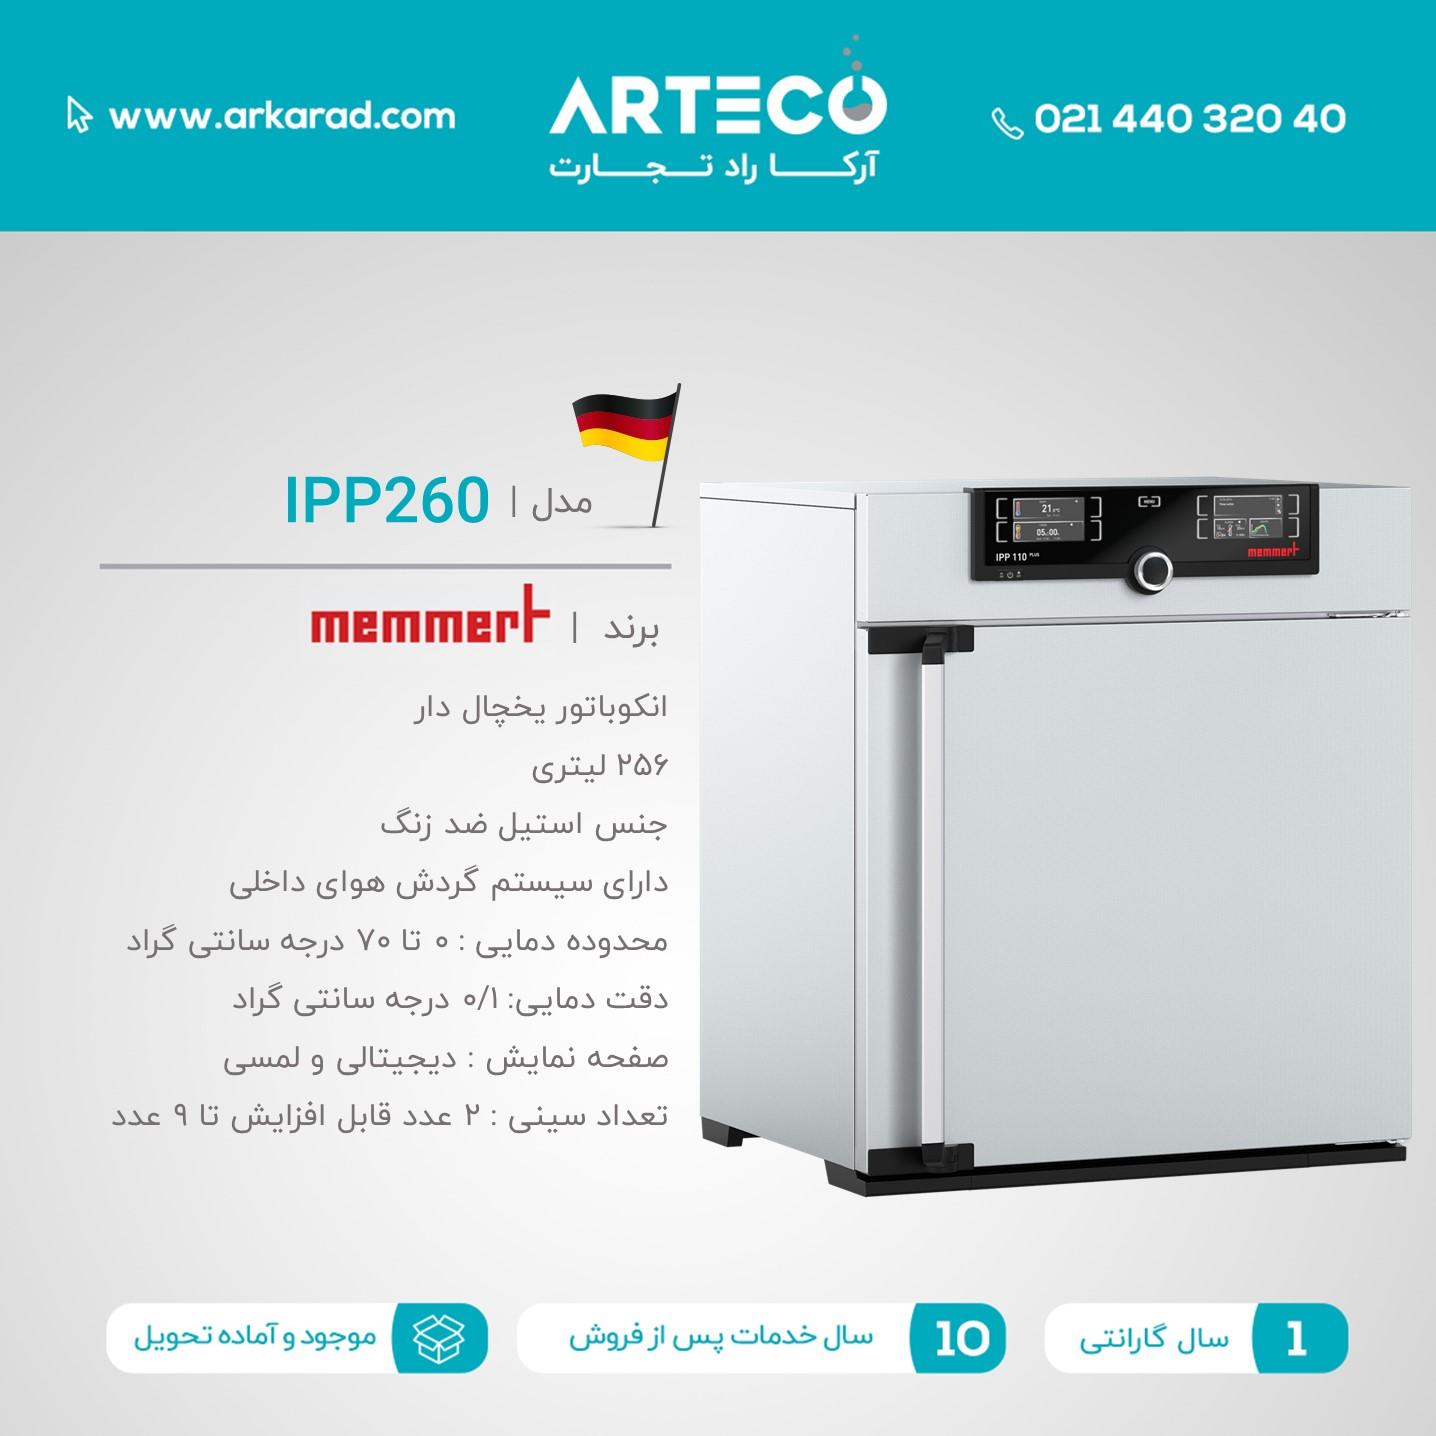 انکوباتور یخچالدار مدل IPP260 برند Memmert